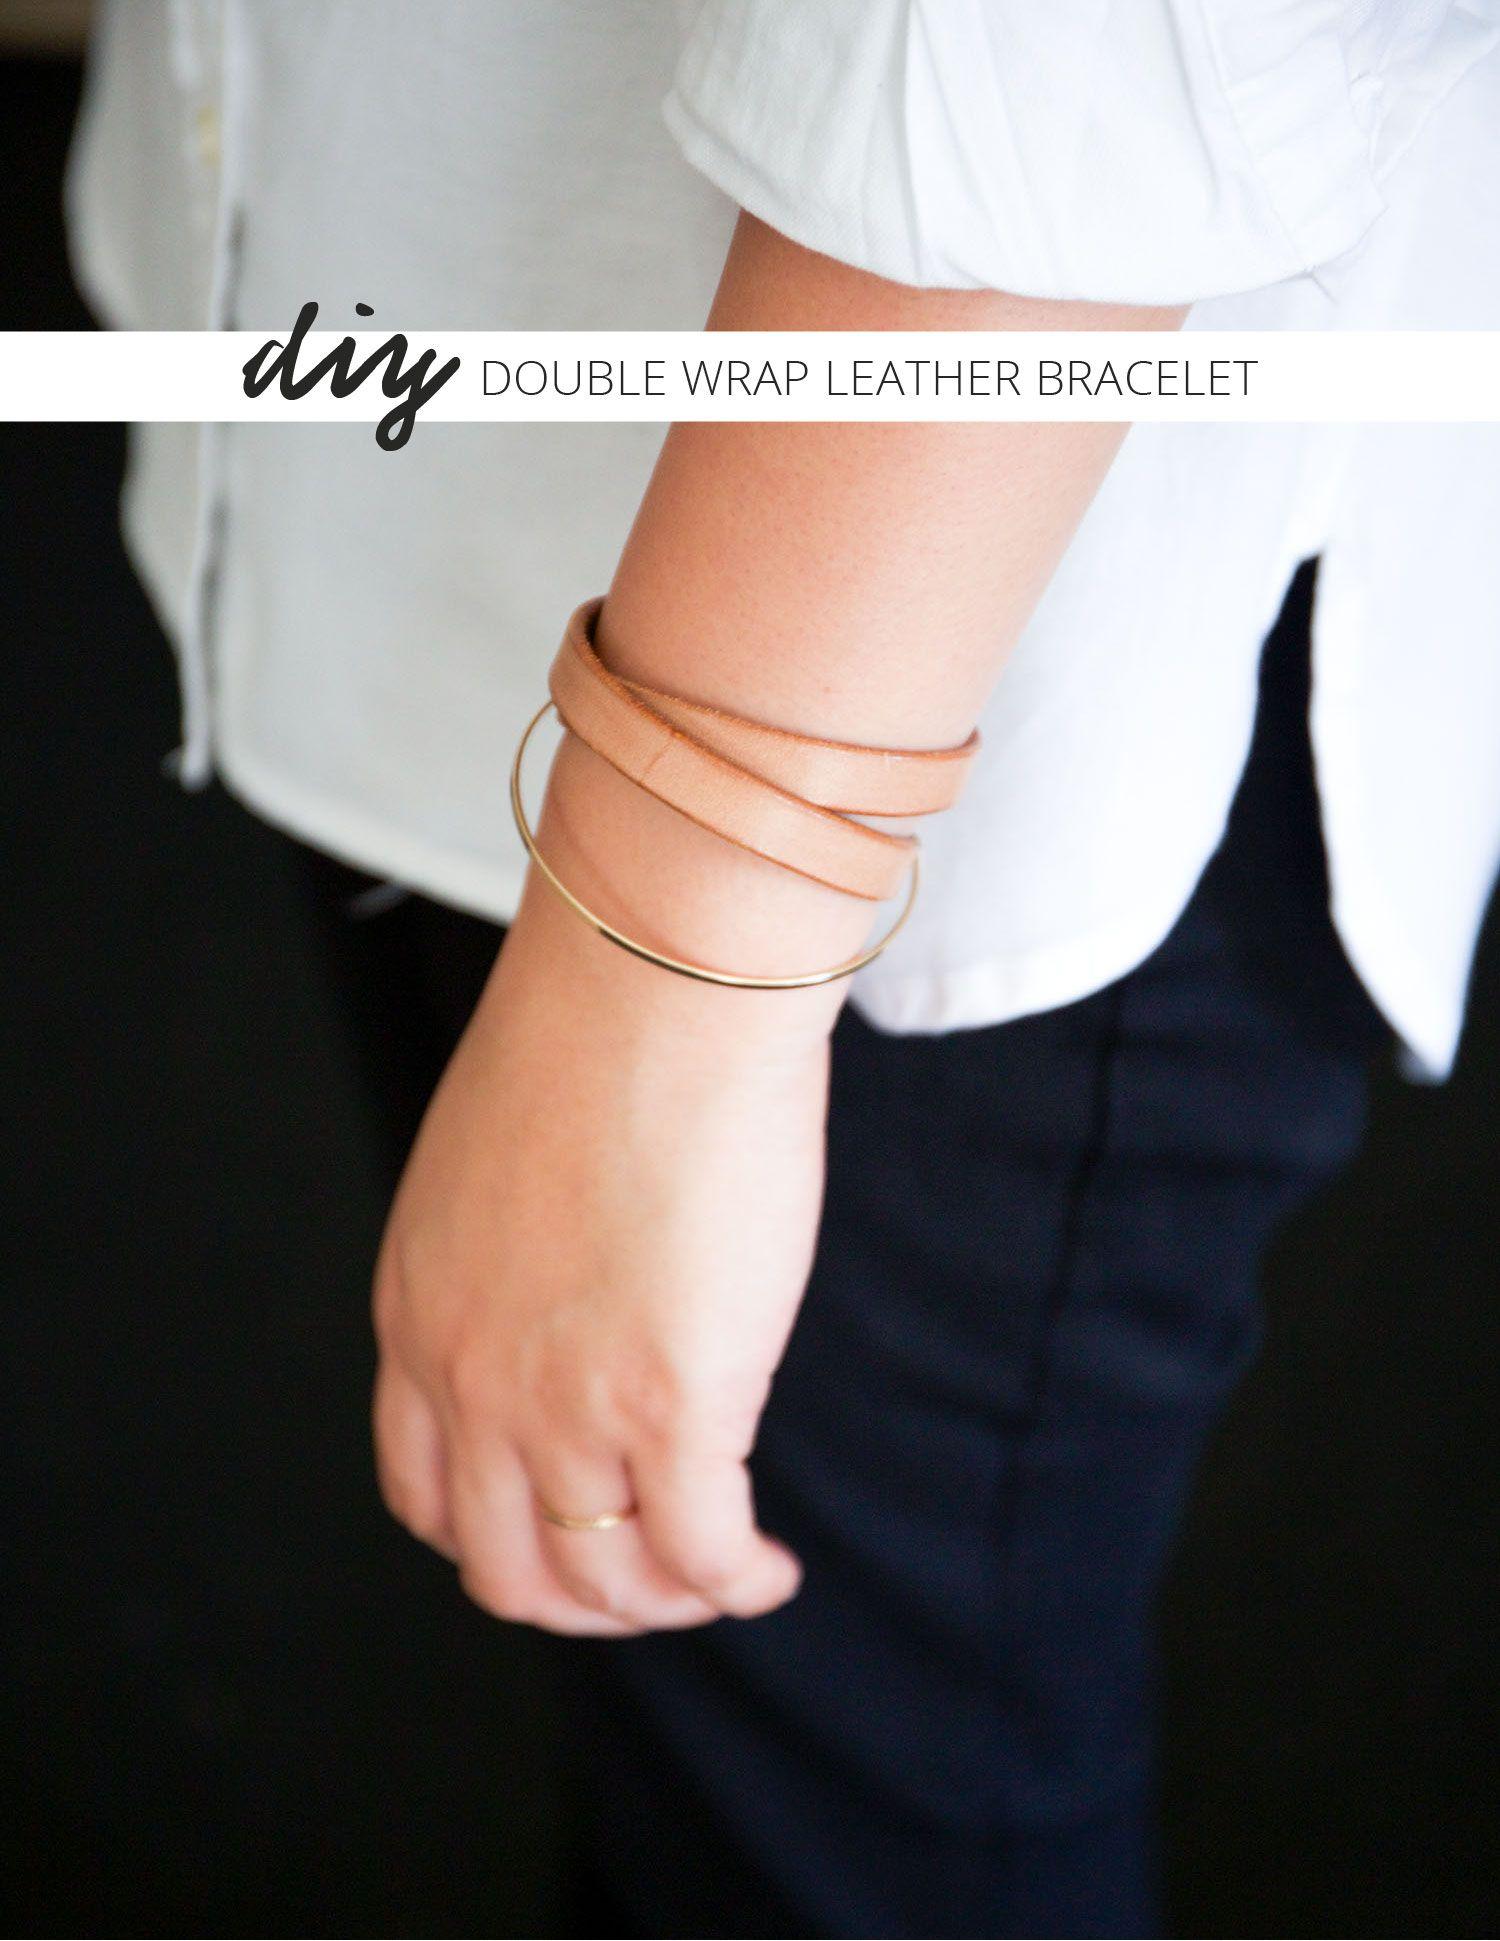 DIY Double Wrap Leather Bracelet w/ FREE printable pattern. ClothStory.com